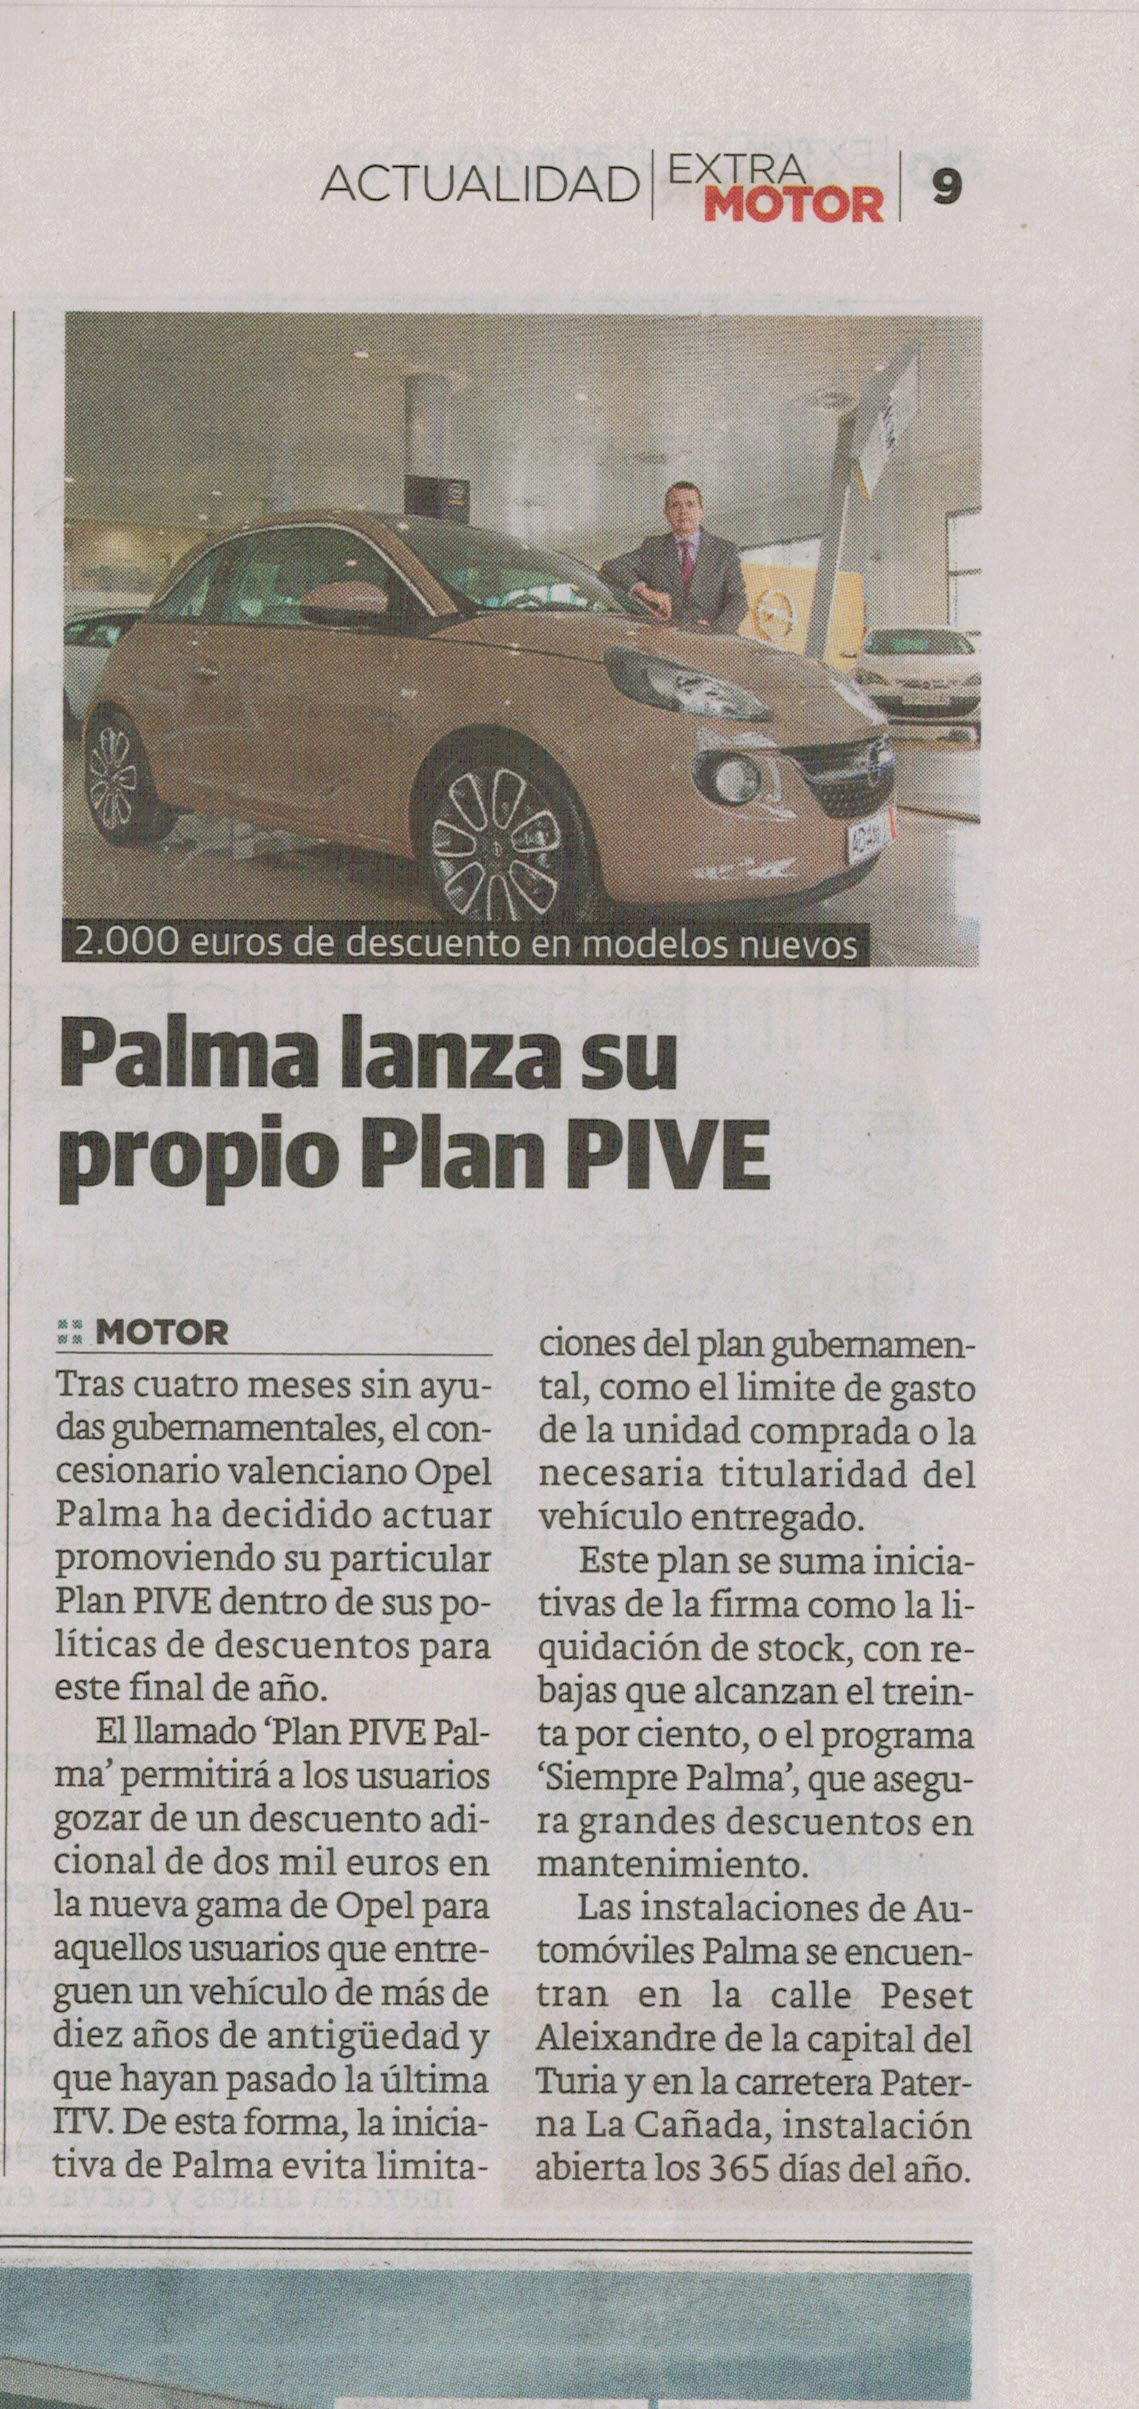 Palma lanza su propio Plan PIVE